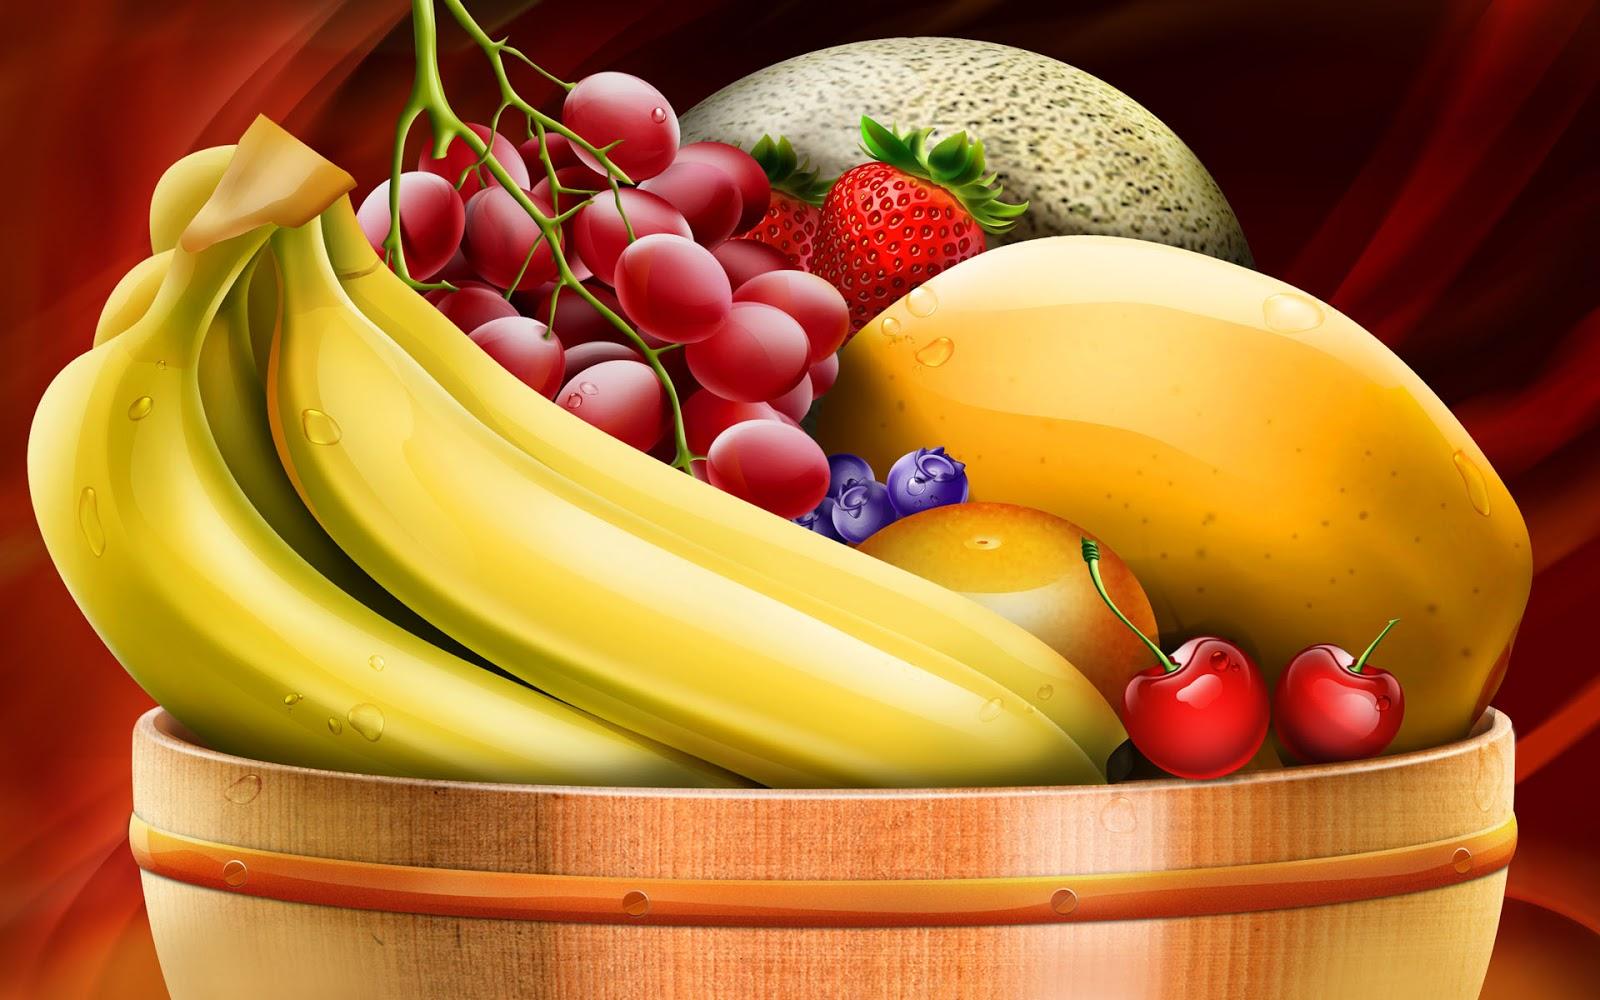 PRITI EYRA'S WORLD: EATING FRUITS